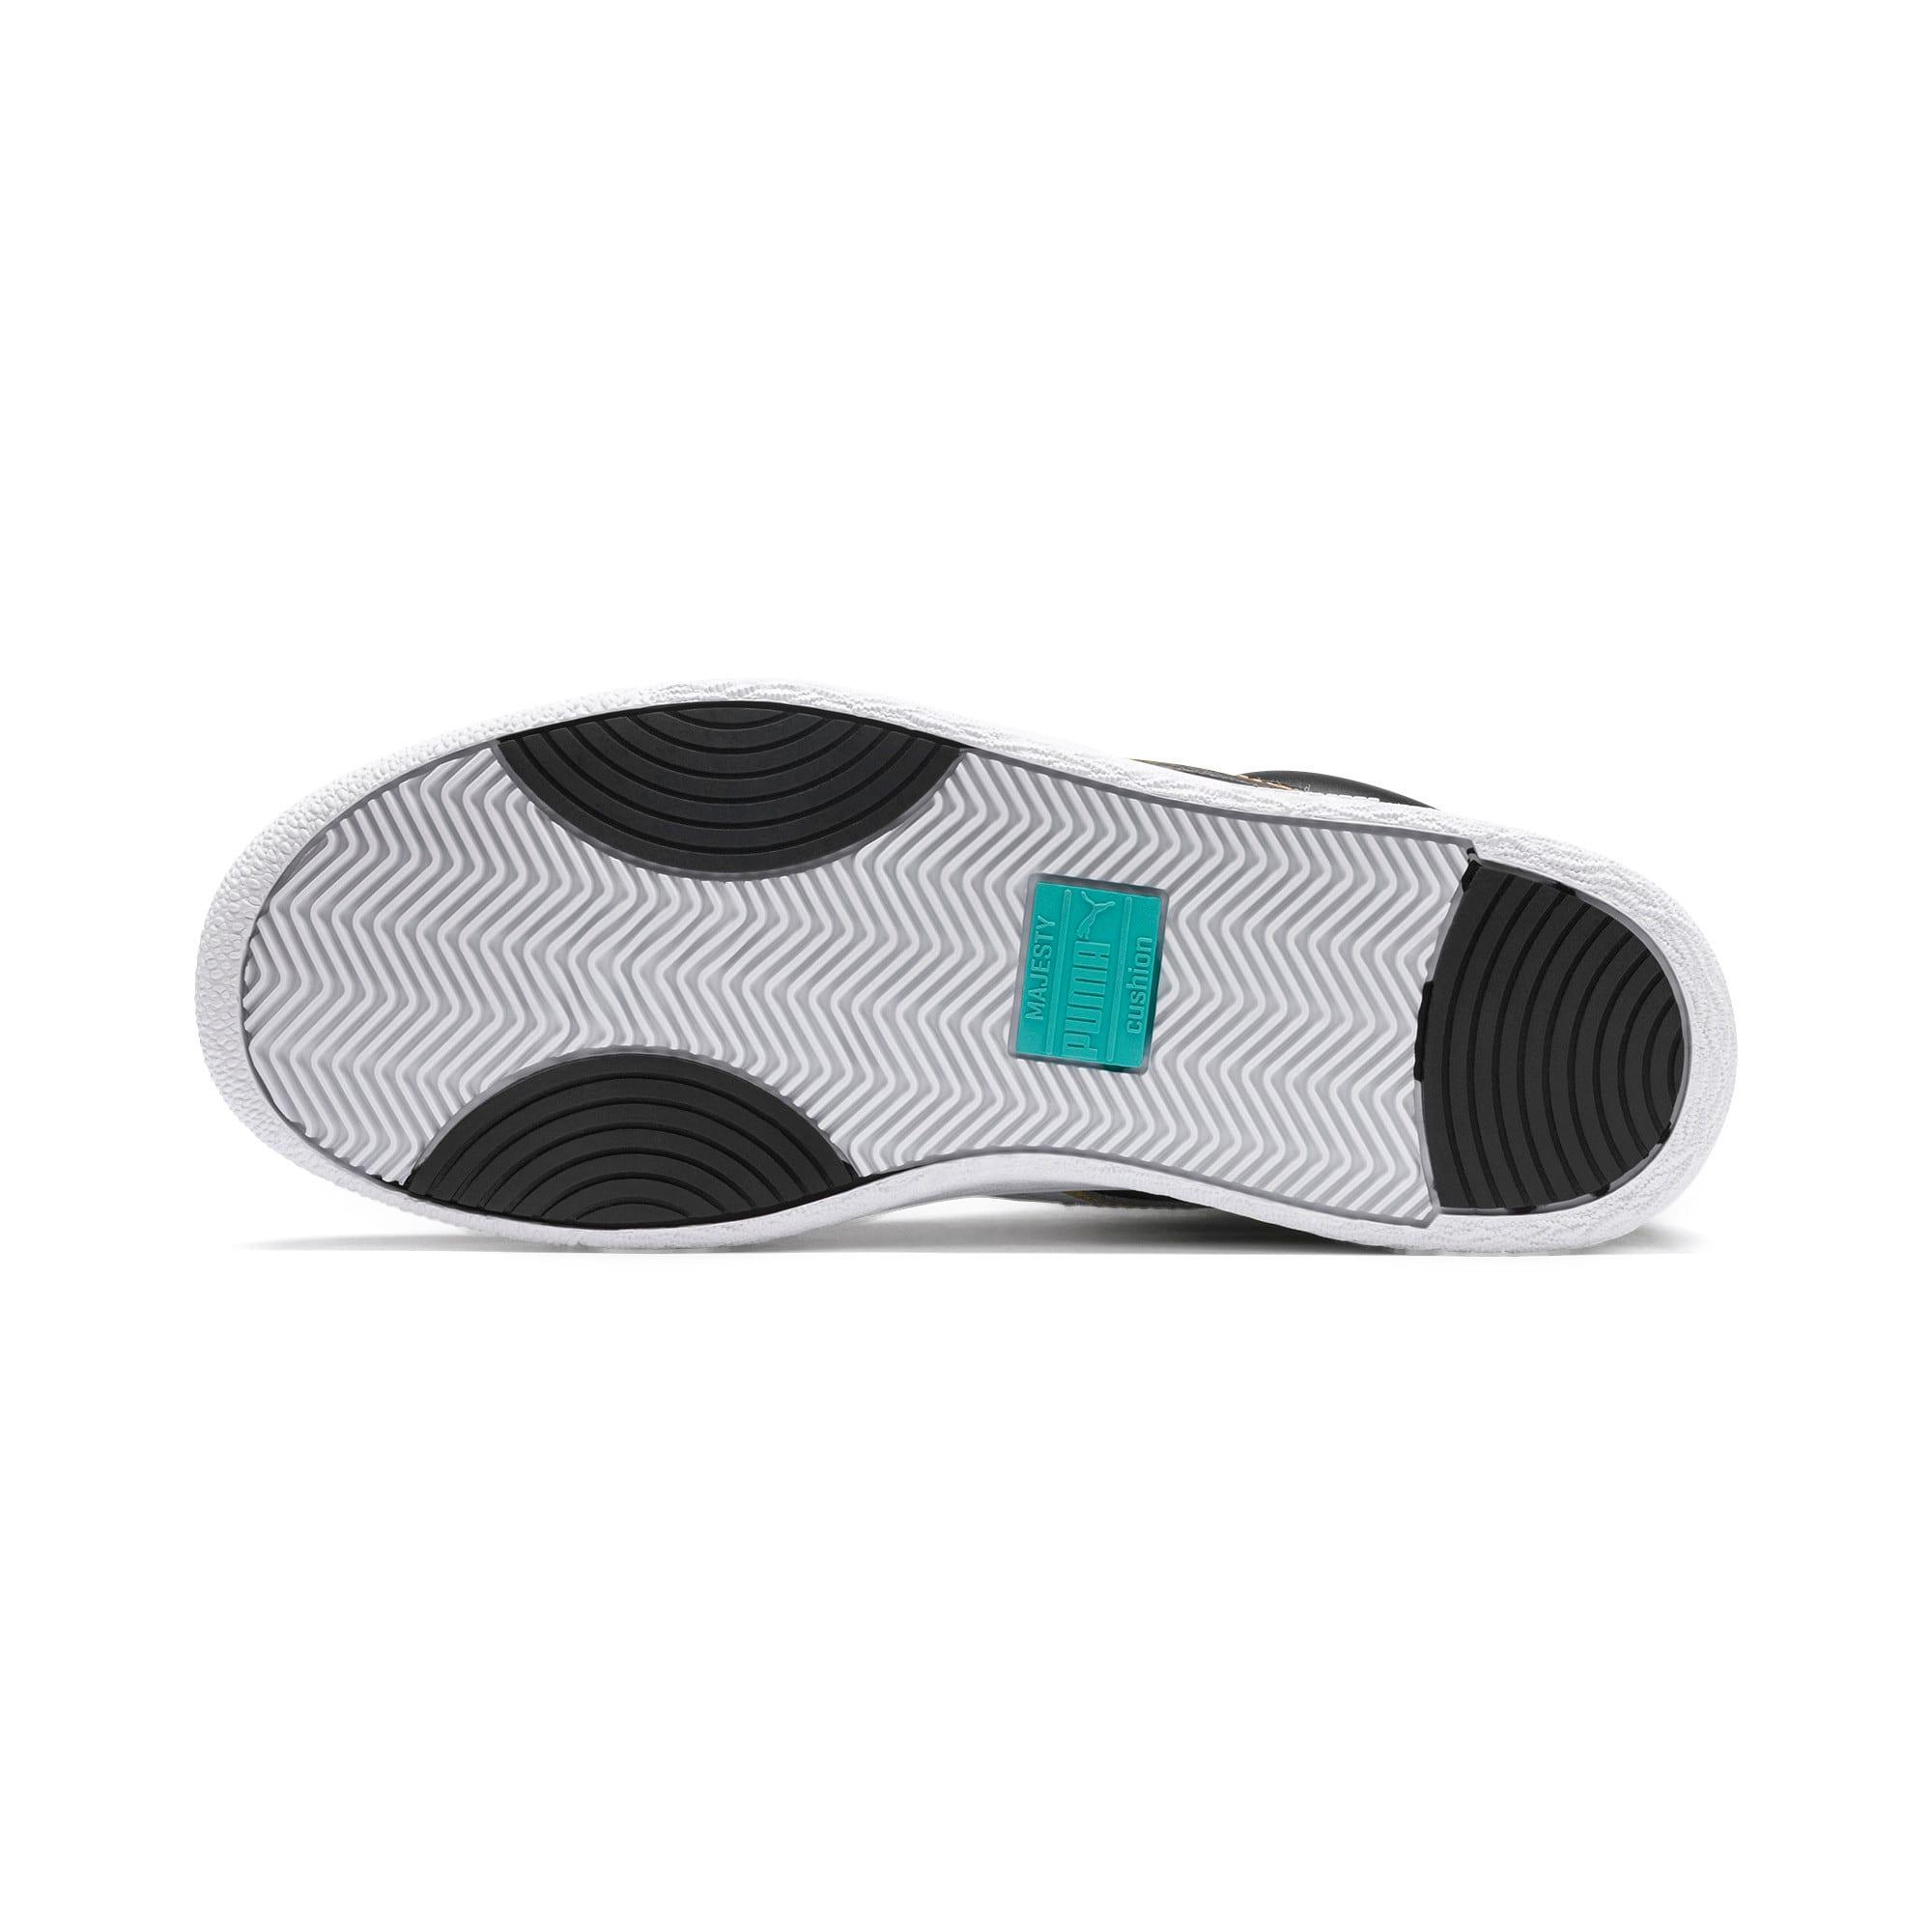 Thumbnail 5 of Ralph Sampson Mid Hoops Sneakers, Puma Blk-Puma Wht-Puma Wht, medium